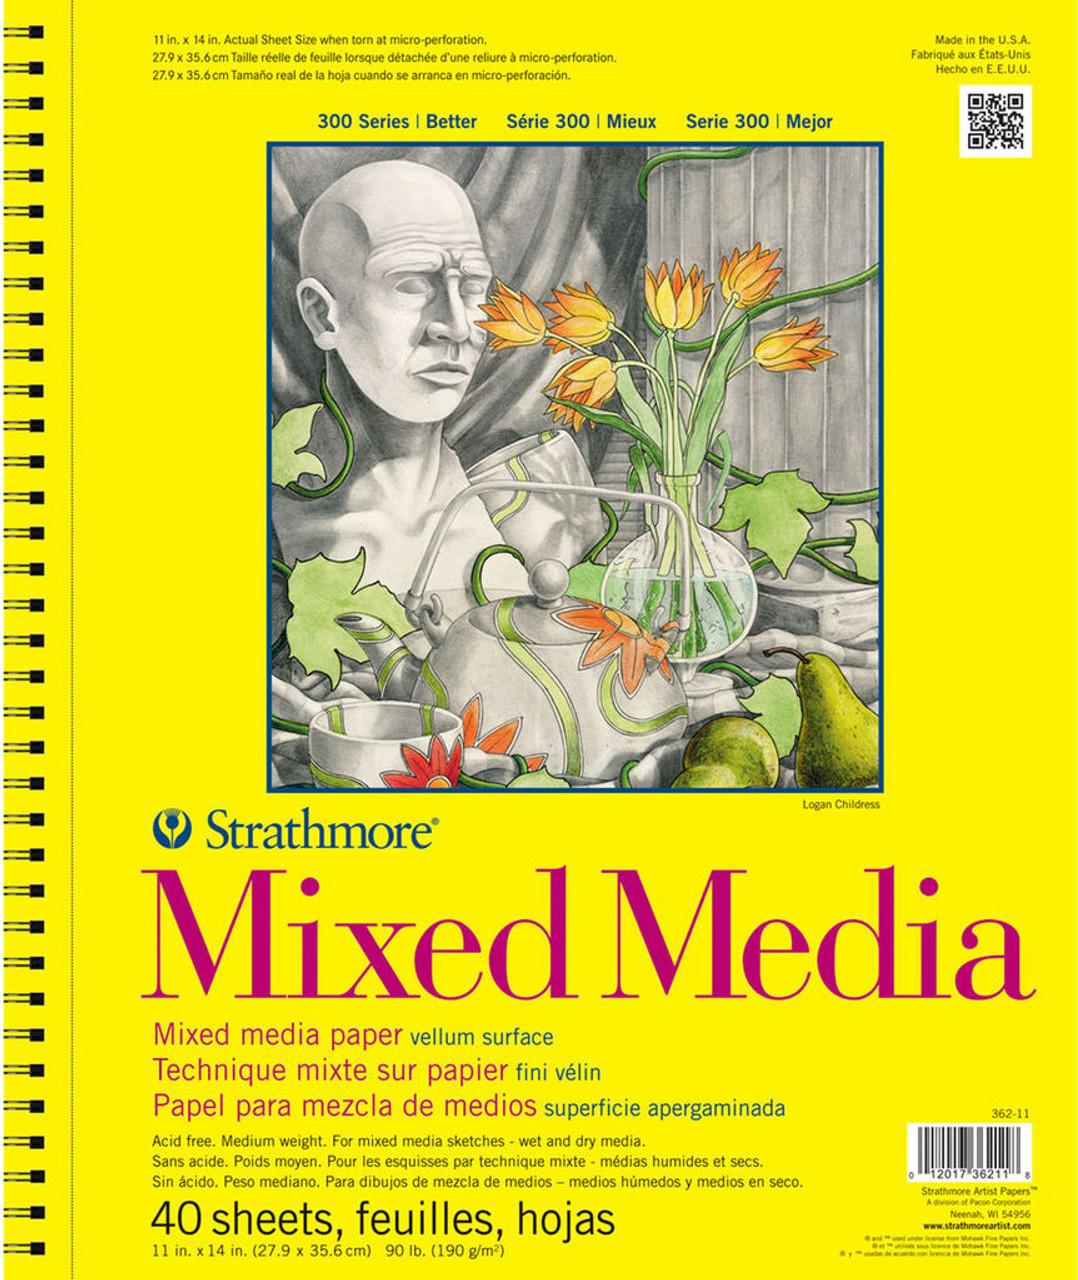 Strathmore 300 Series Mixed Media Pad 9x12